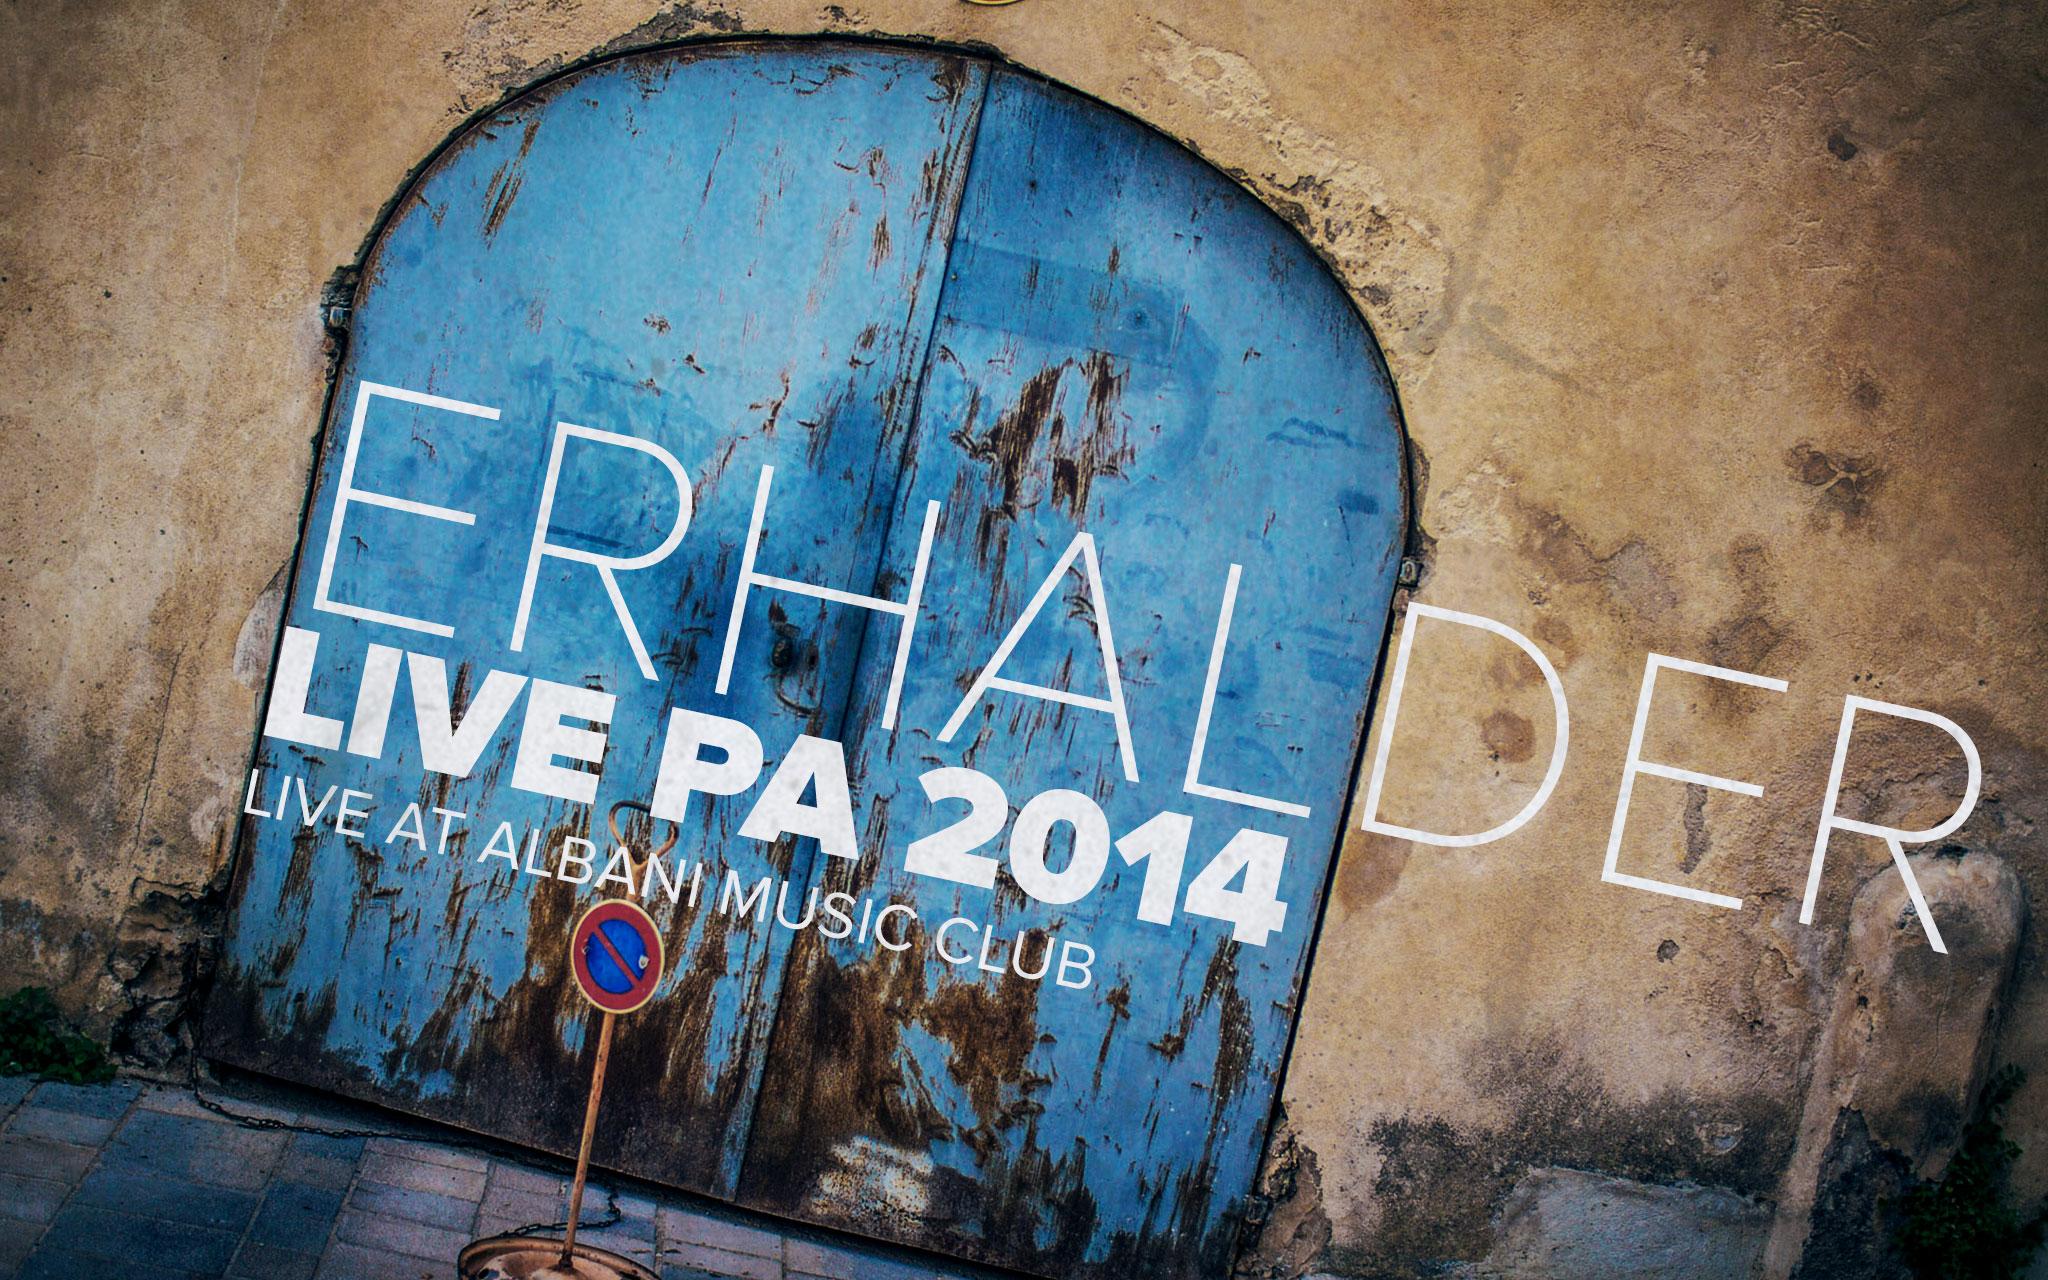 Live Album: Erhalder PA 2014